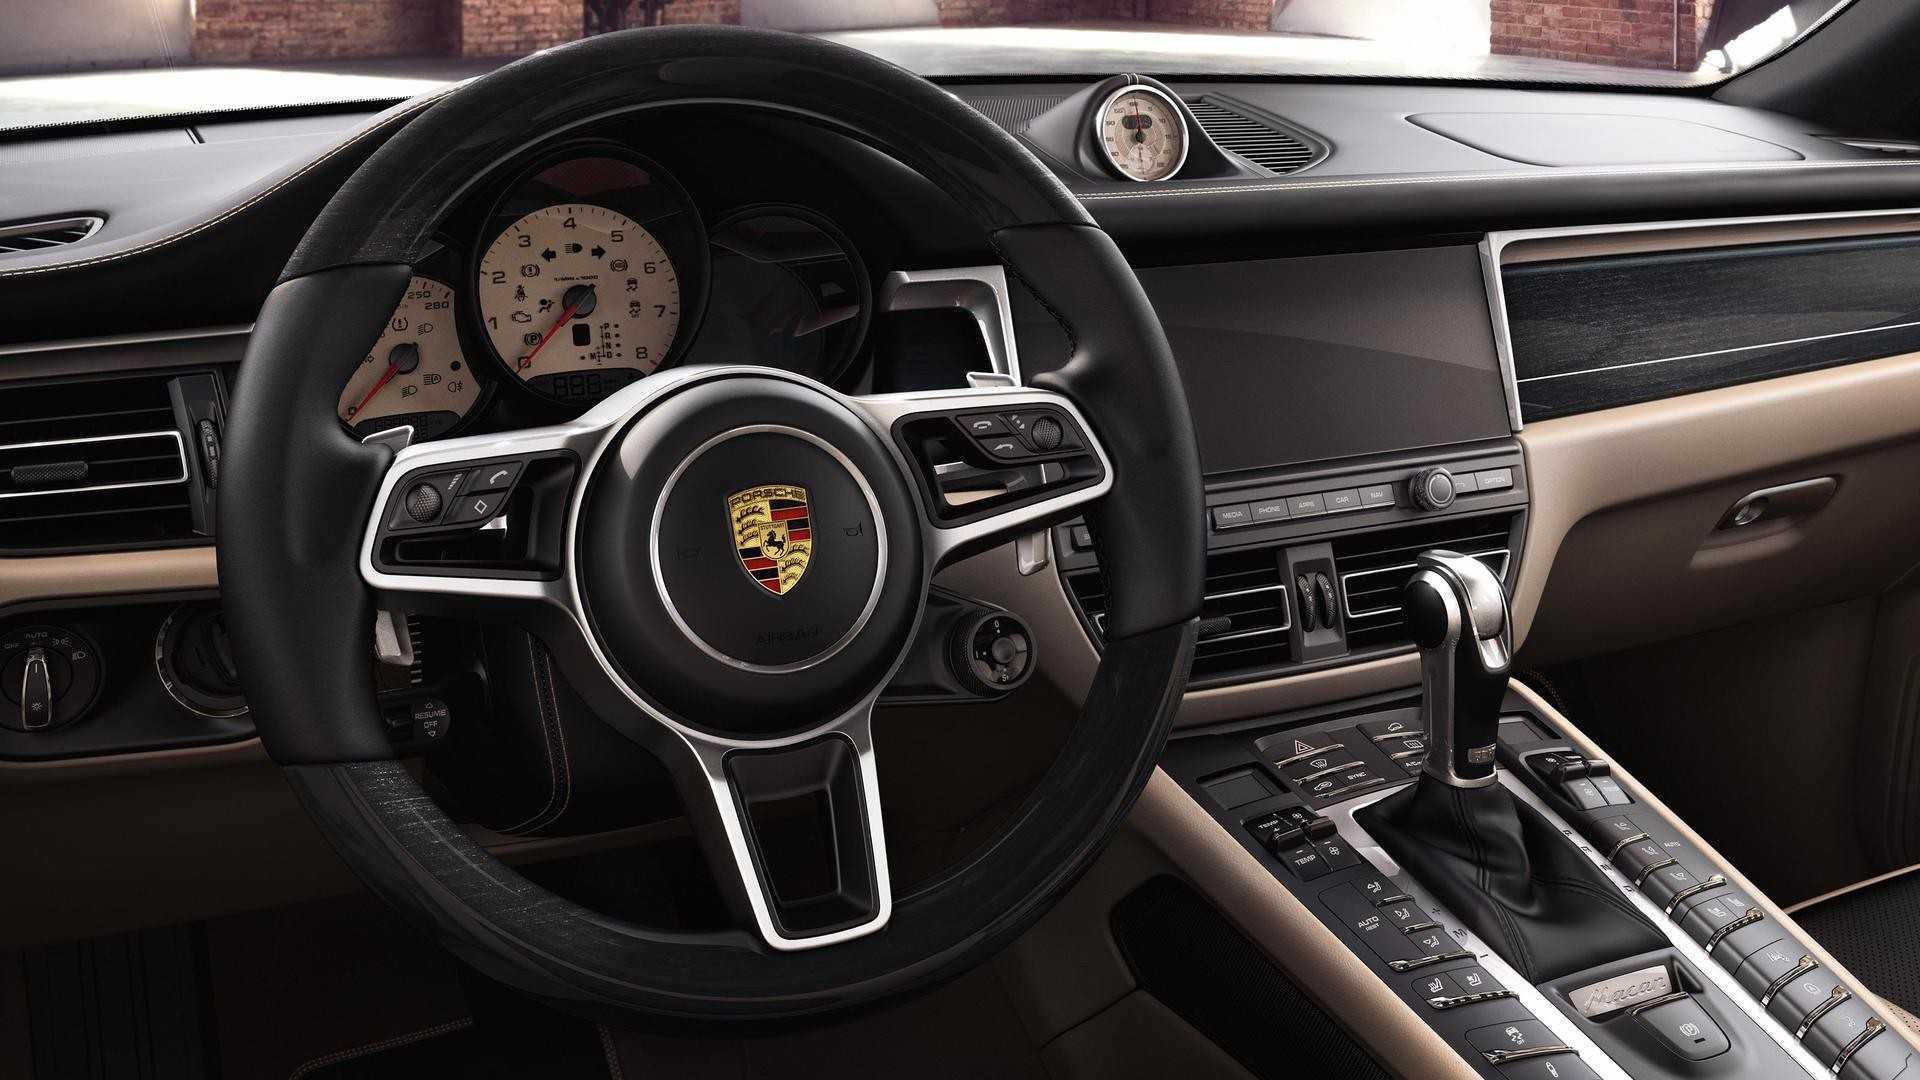 Macan S получил тюнинг от Porsche Exclusive Manufaktur 2